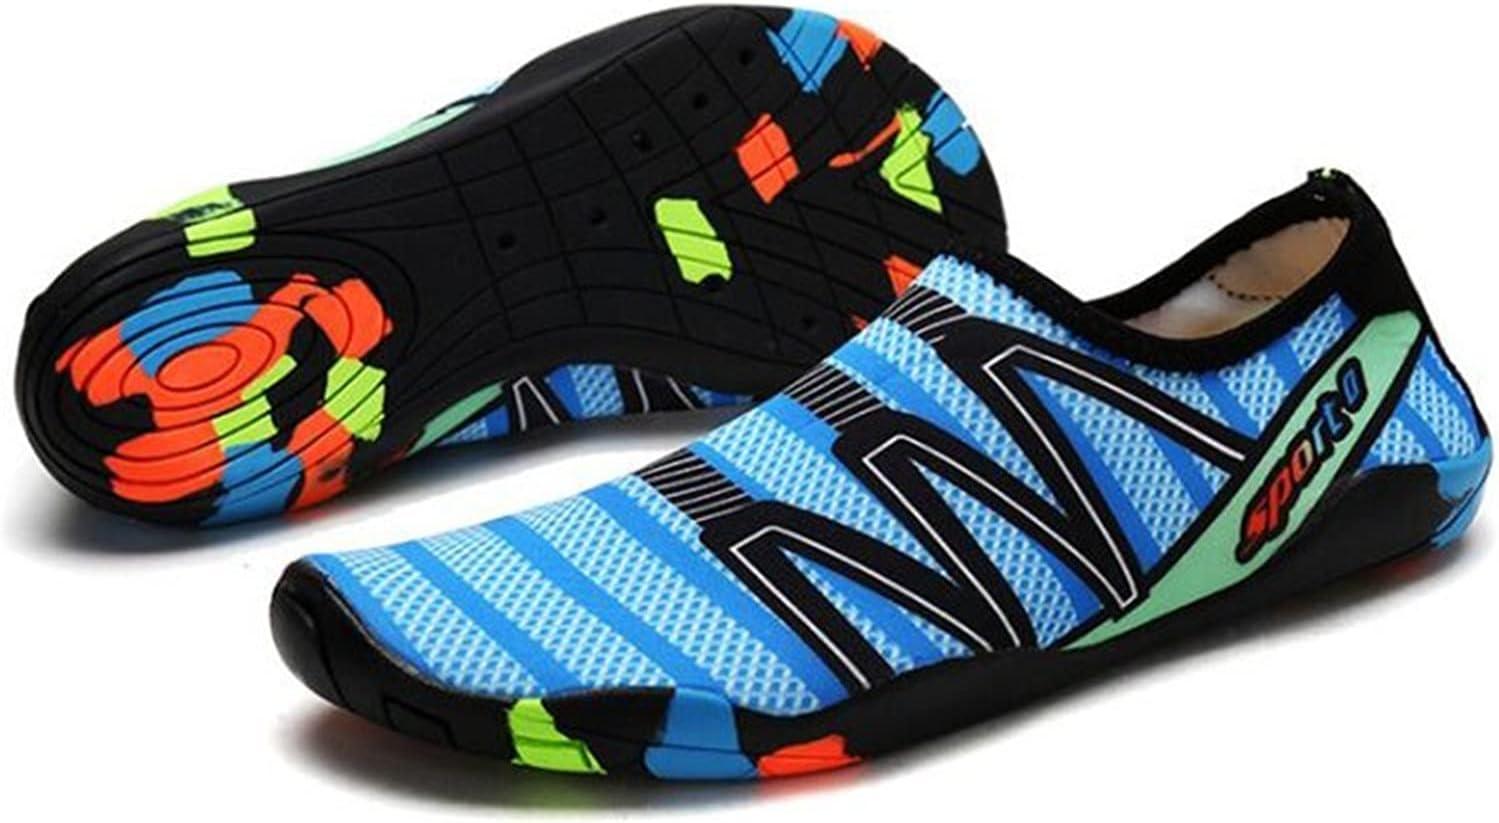 CLNYRO Men Women Aqua Shoes Japan Maker Max 81% OFF New Footwear Dry Quick Sneakers Swimming